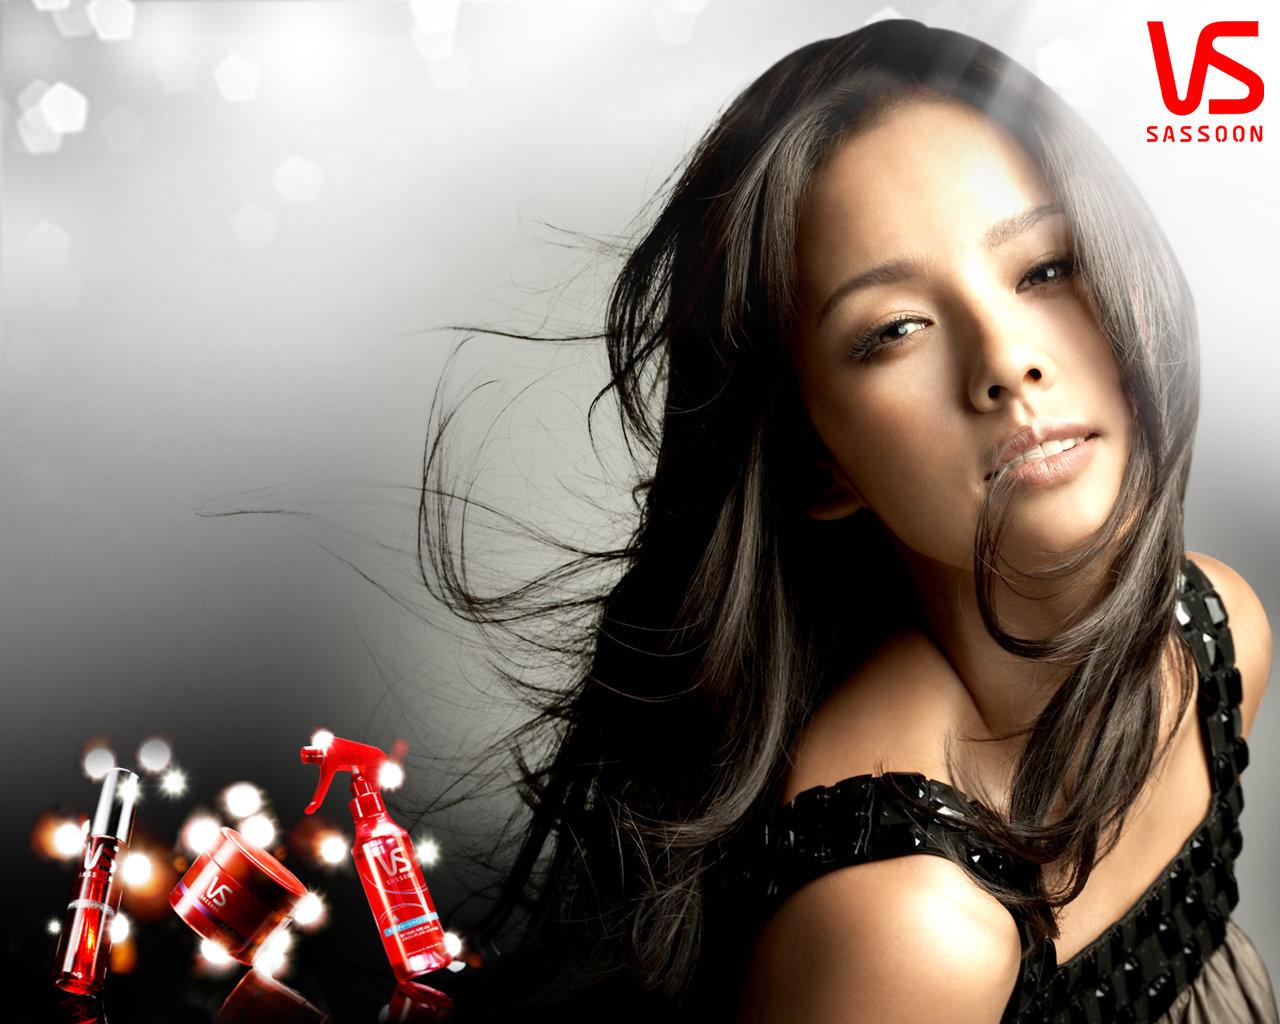 http://4.bp.blogspot.com/_qCxYF--ppyg/TEhacFR1nOI/AAAAAAAAECA/5yJjrPvOJcU/s1600/Hyori-Lee-i114311.jpg